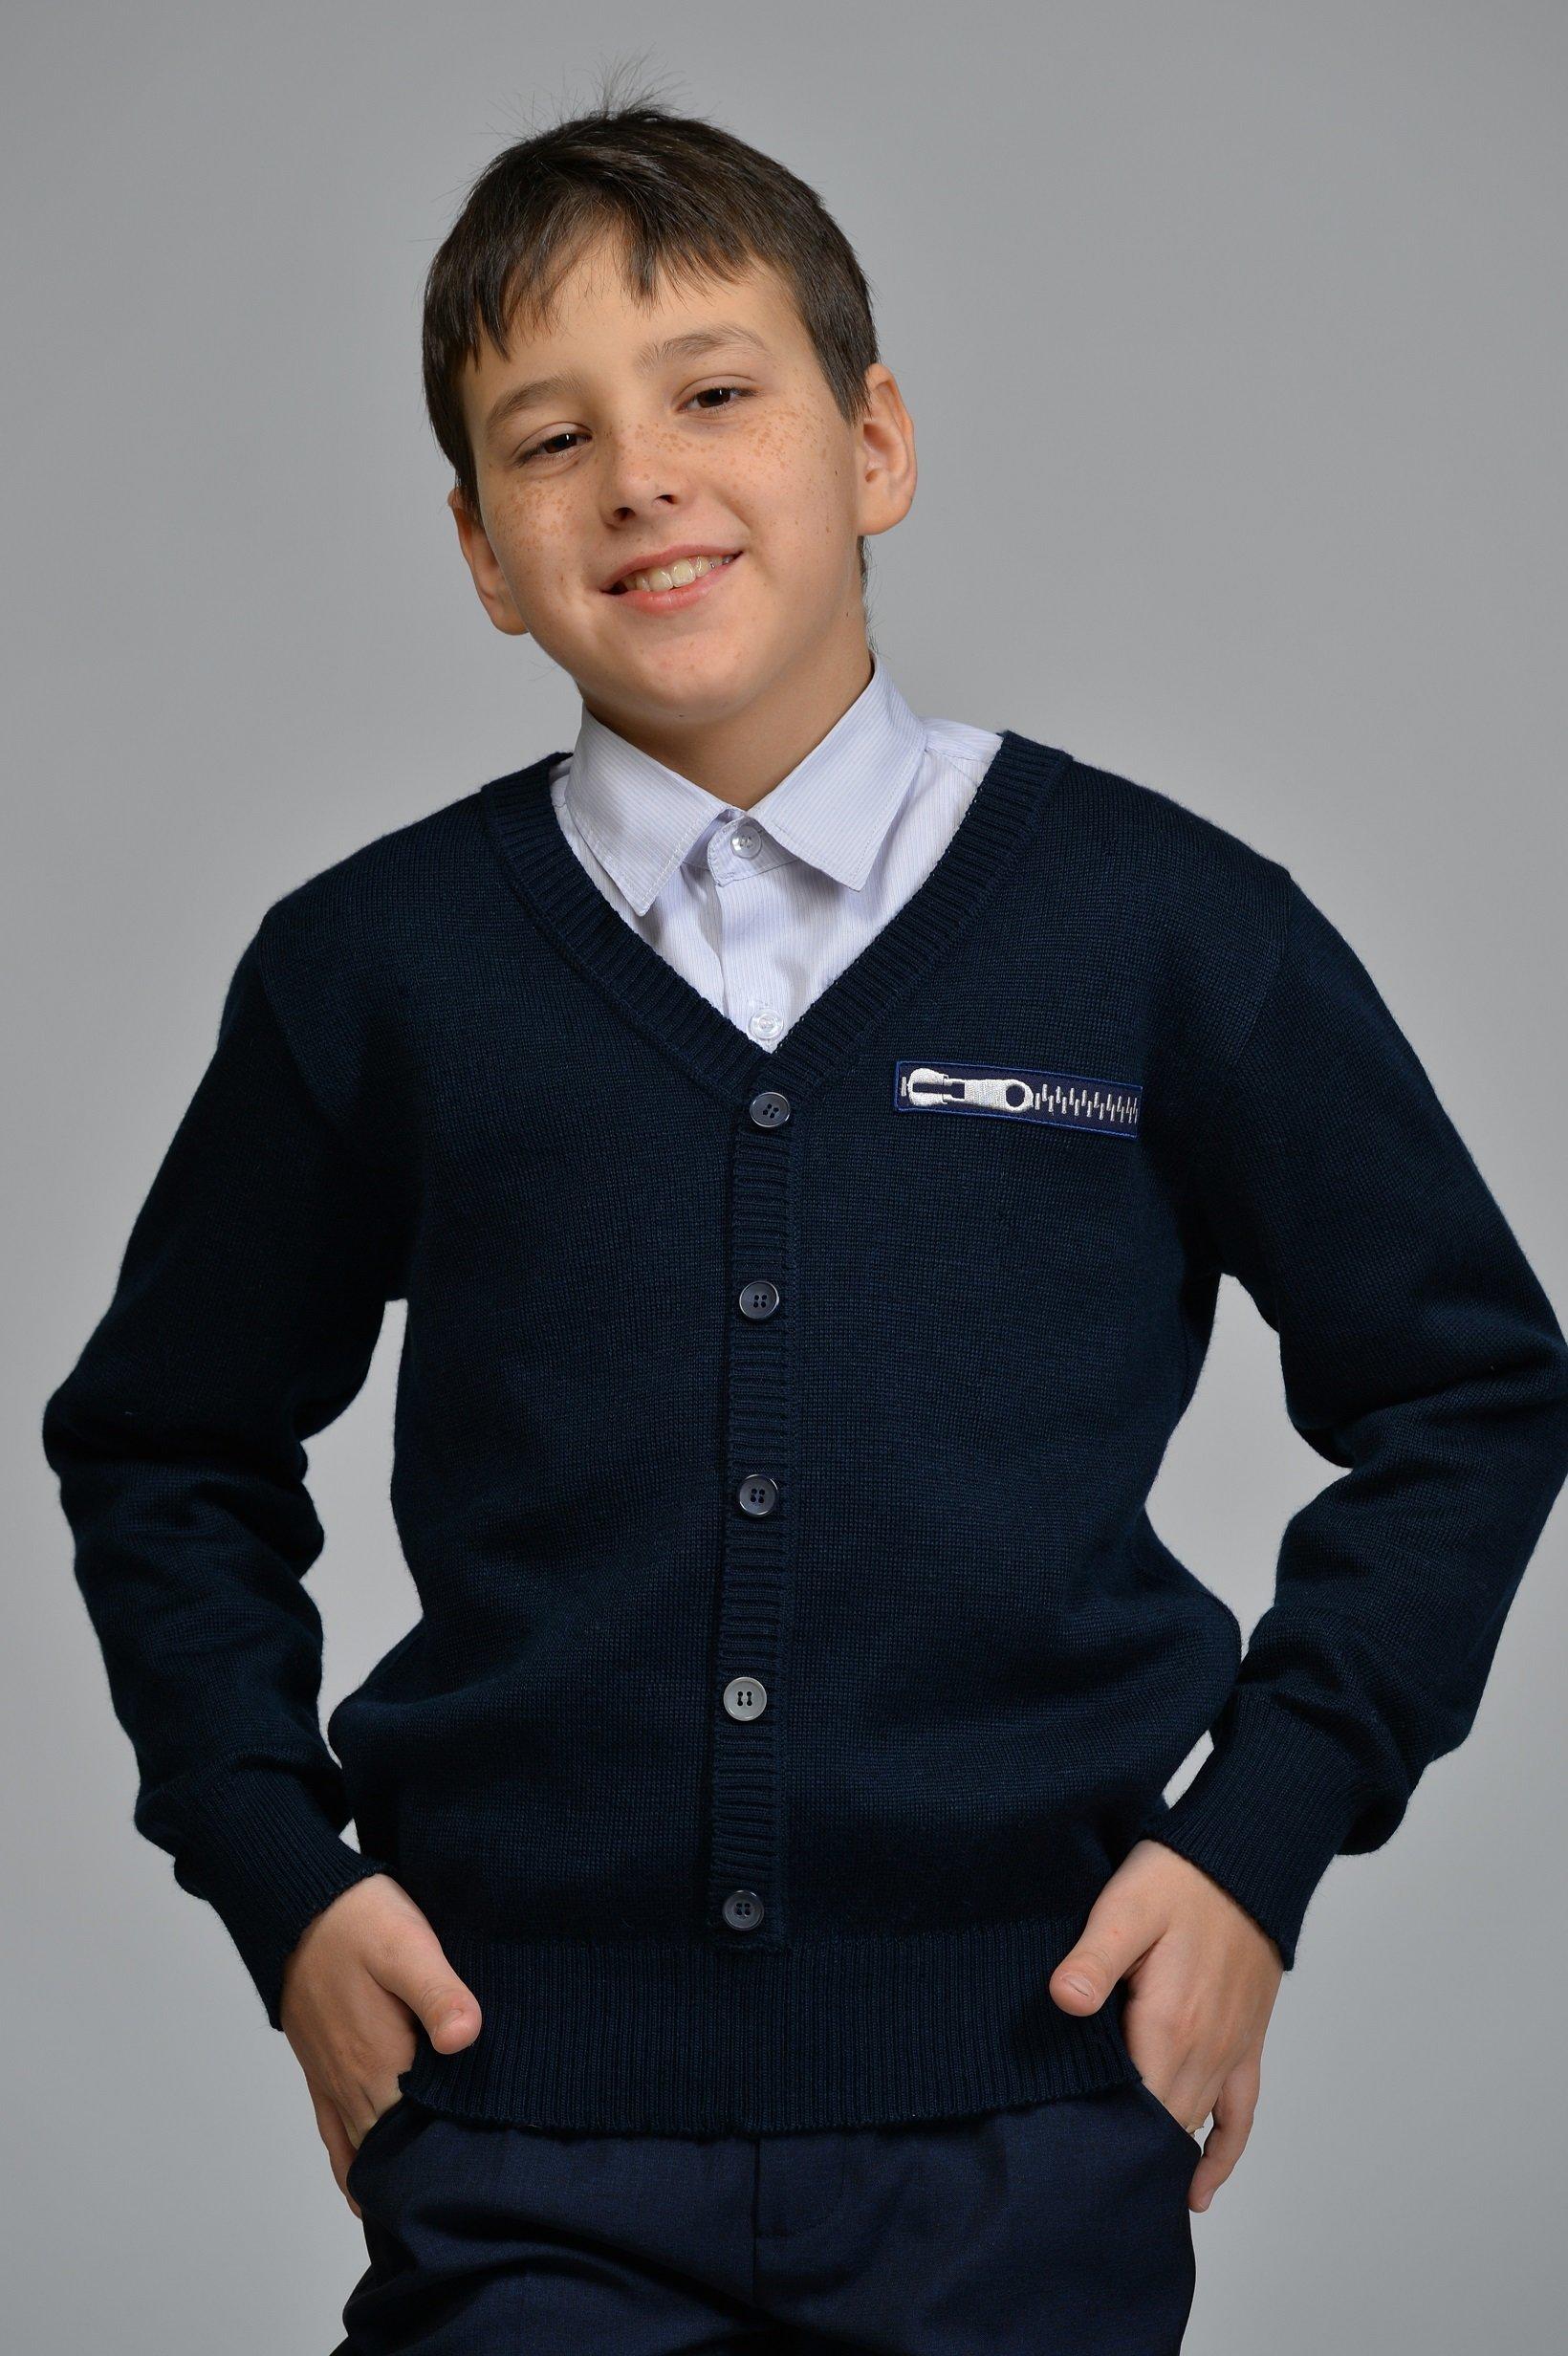 Пуловер для мальчика DSDT213сер